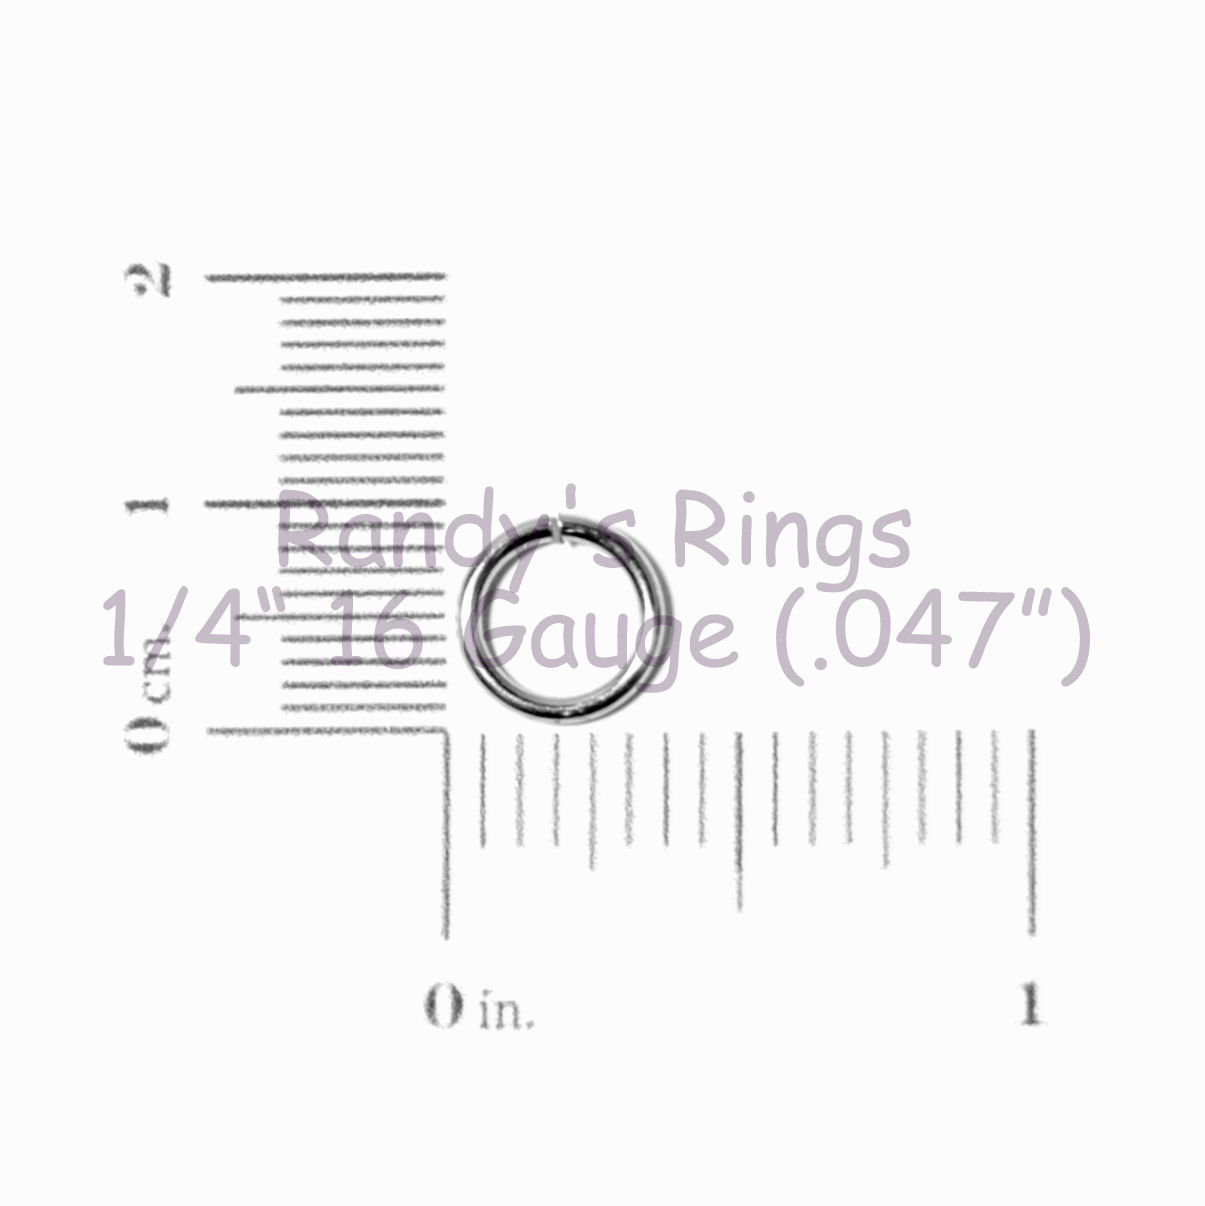 Randy S Rings Gt 1 4 16 Gauge 047 Light Green Jump Rings